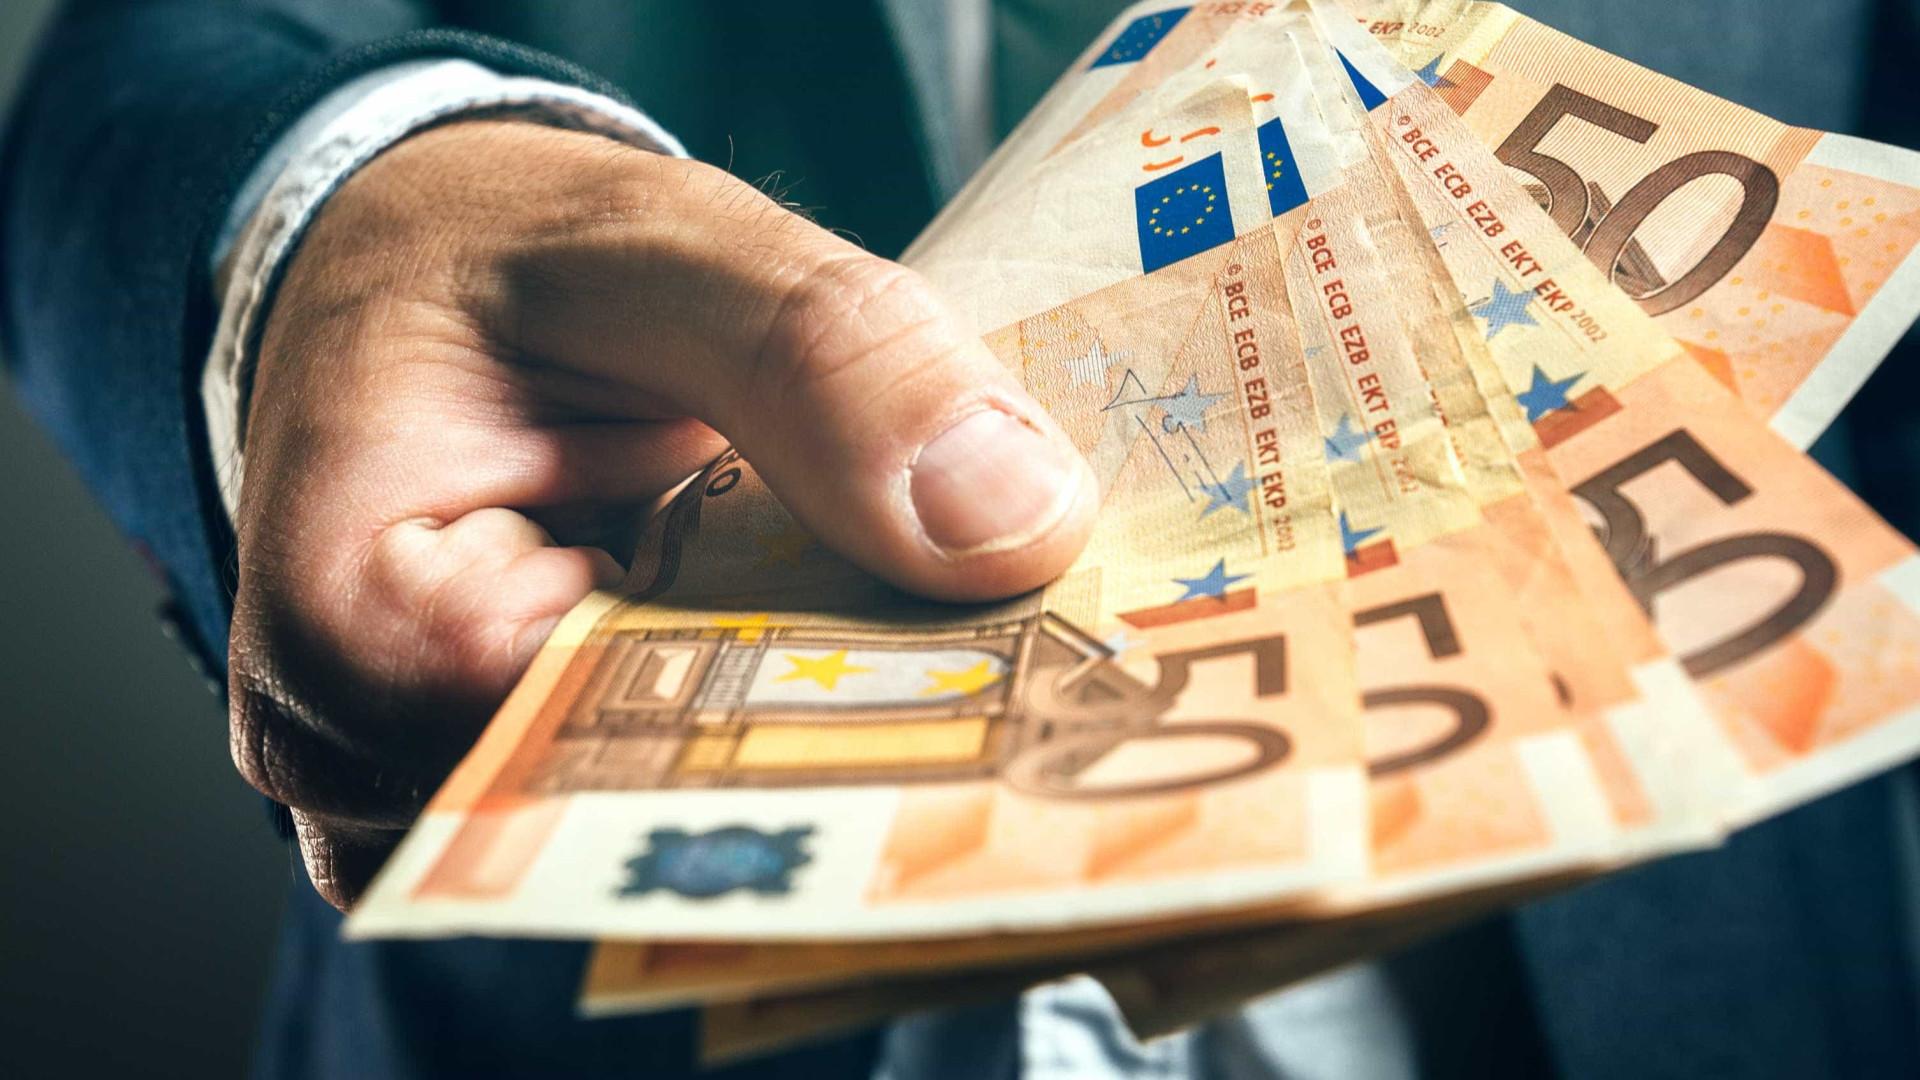 Euro regista nova subida e ultrapassa 1,18 dólares